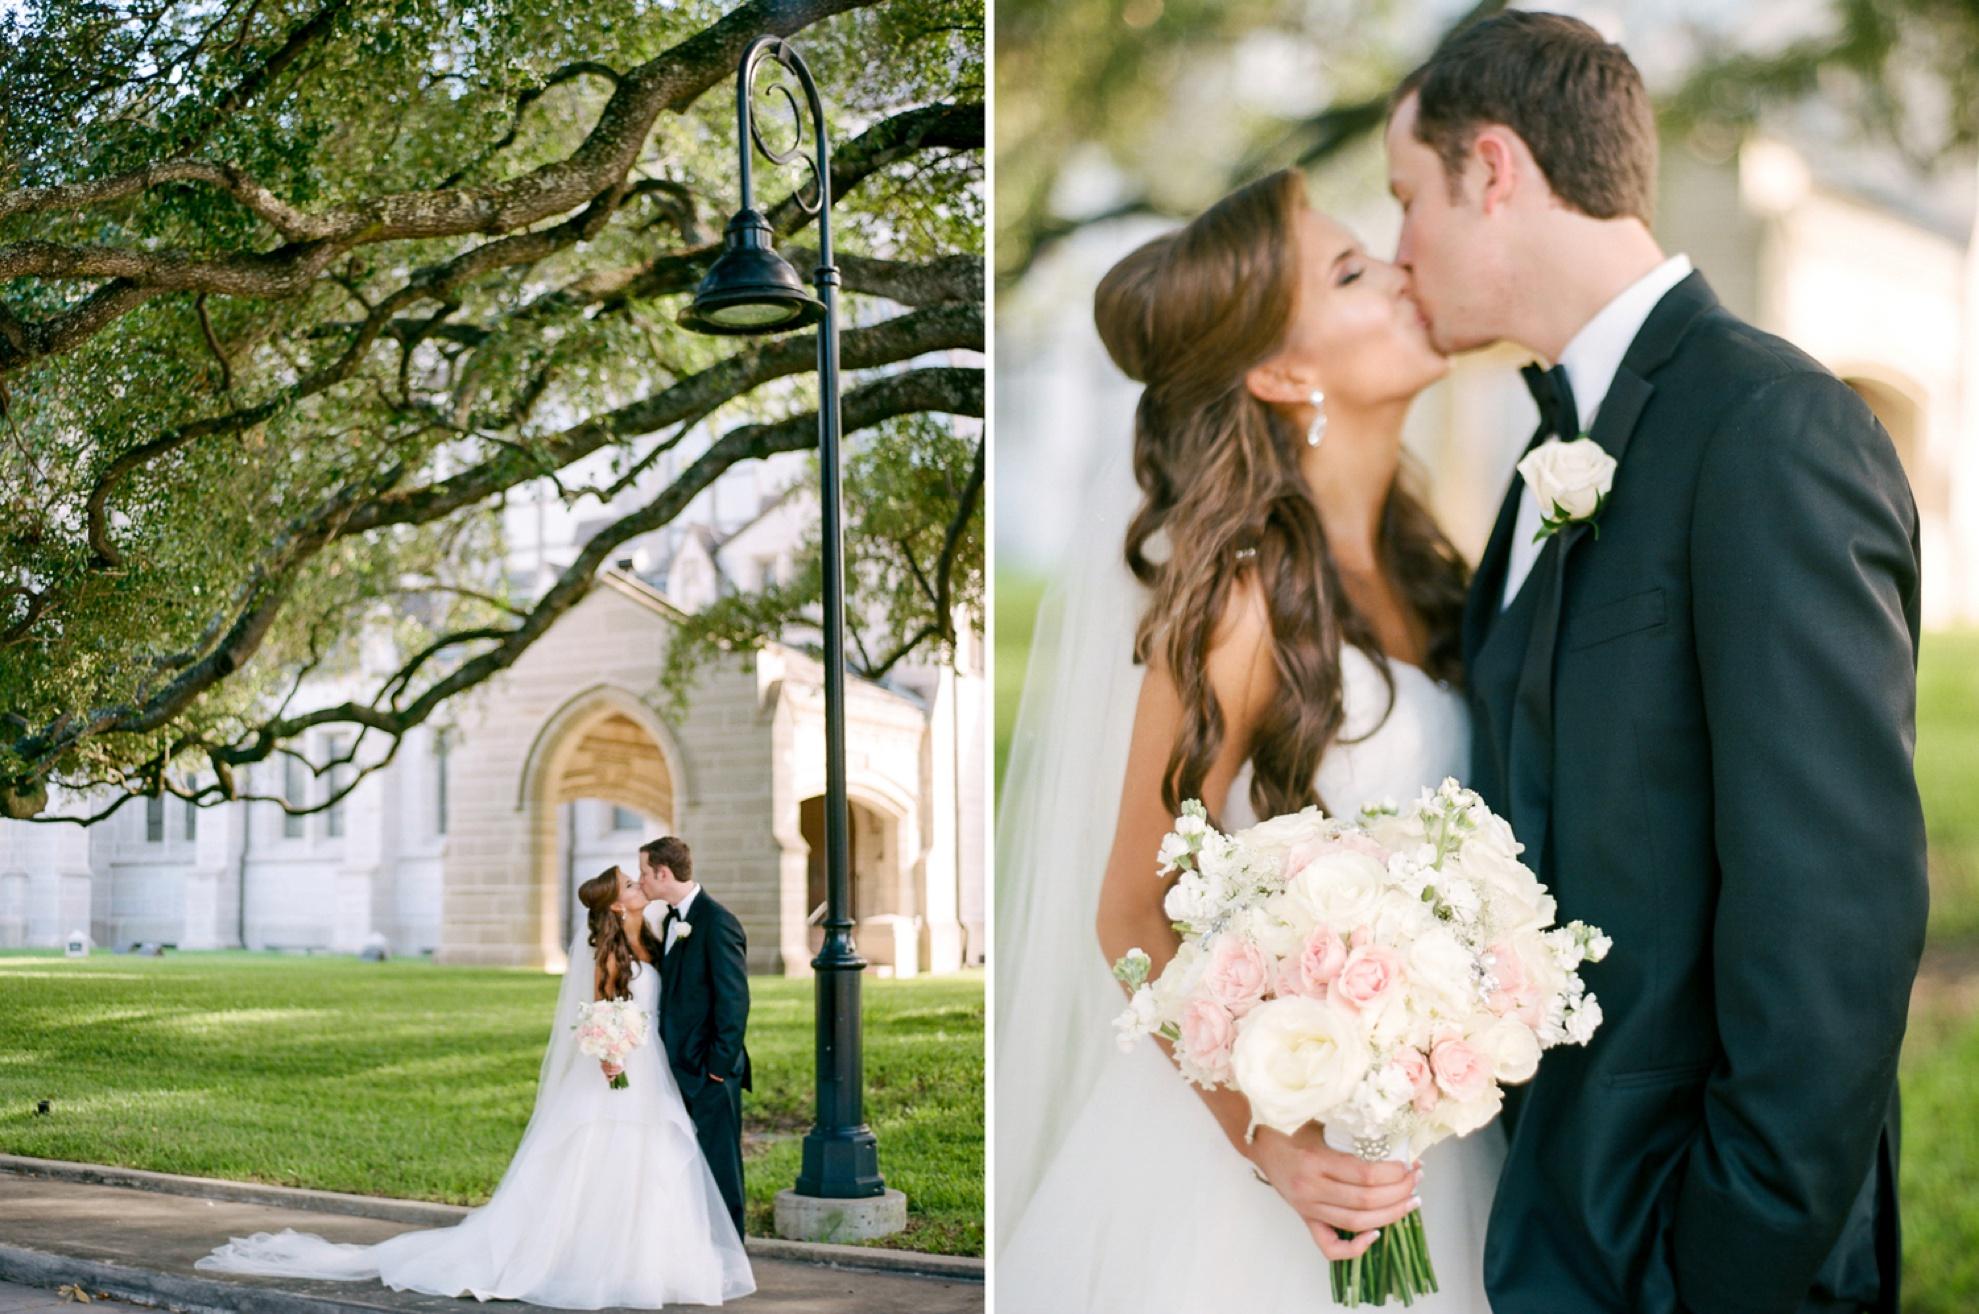 St-Paul's-United Methodist-Wedding-Houston-Photographer-Dana-Fernandez-Weddings-In-Houston-Magazine-Feature-3.jpg